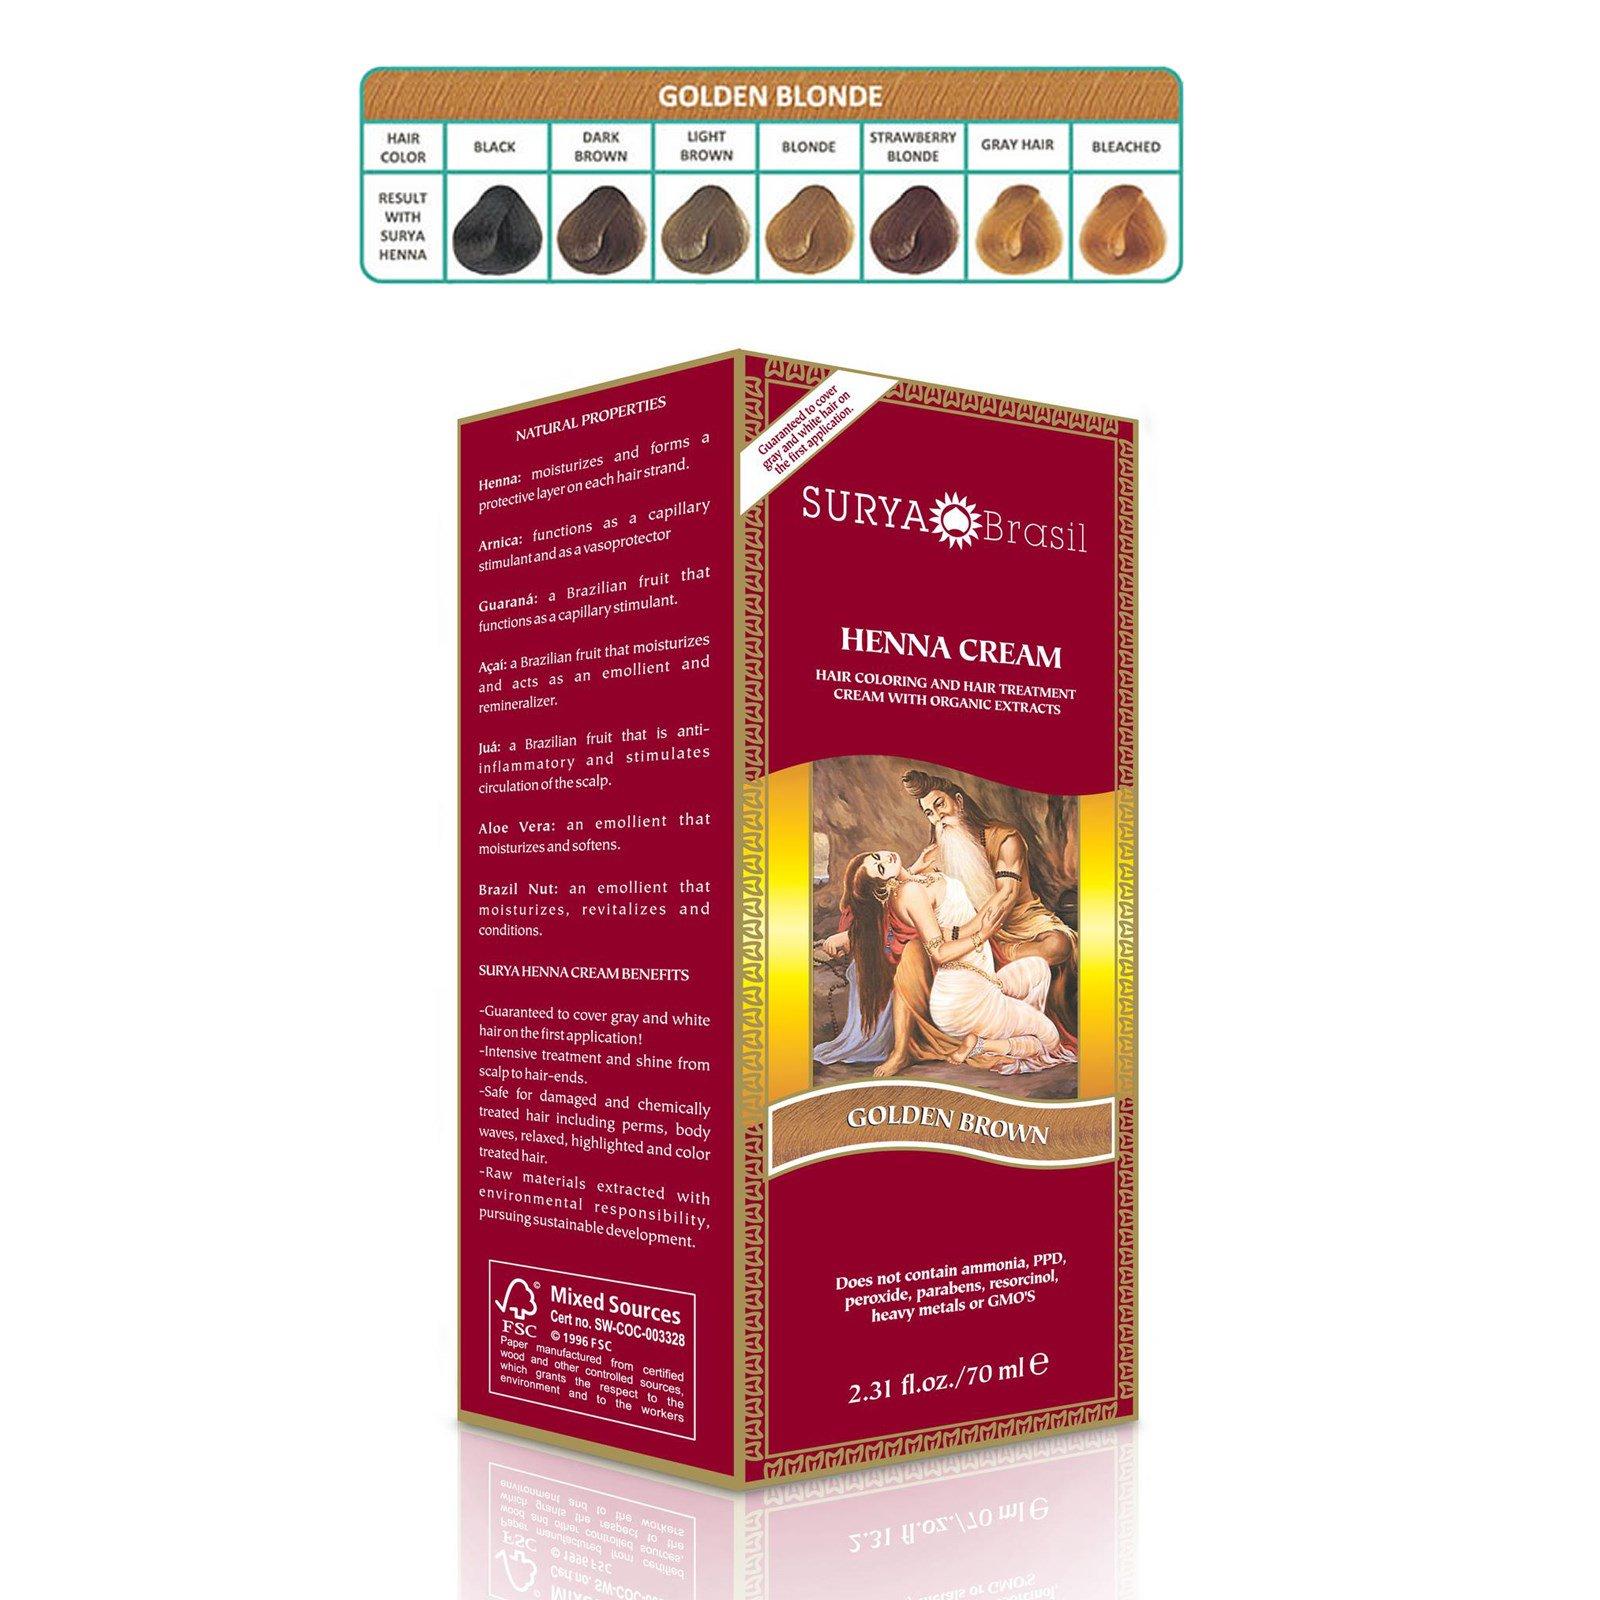 Surya Henna Brasil Cream Hair Coloring Hair Treatment Golden